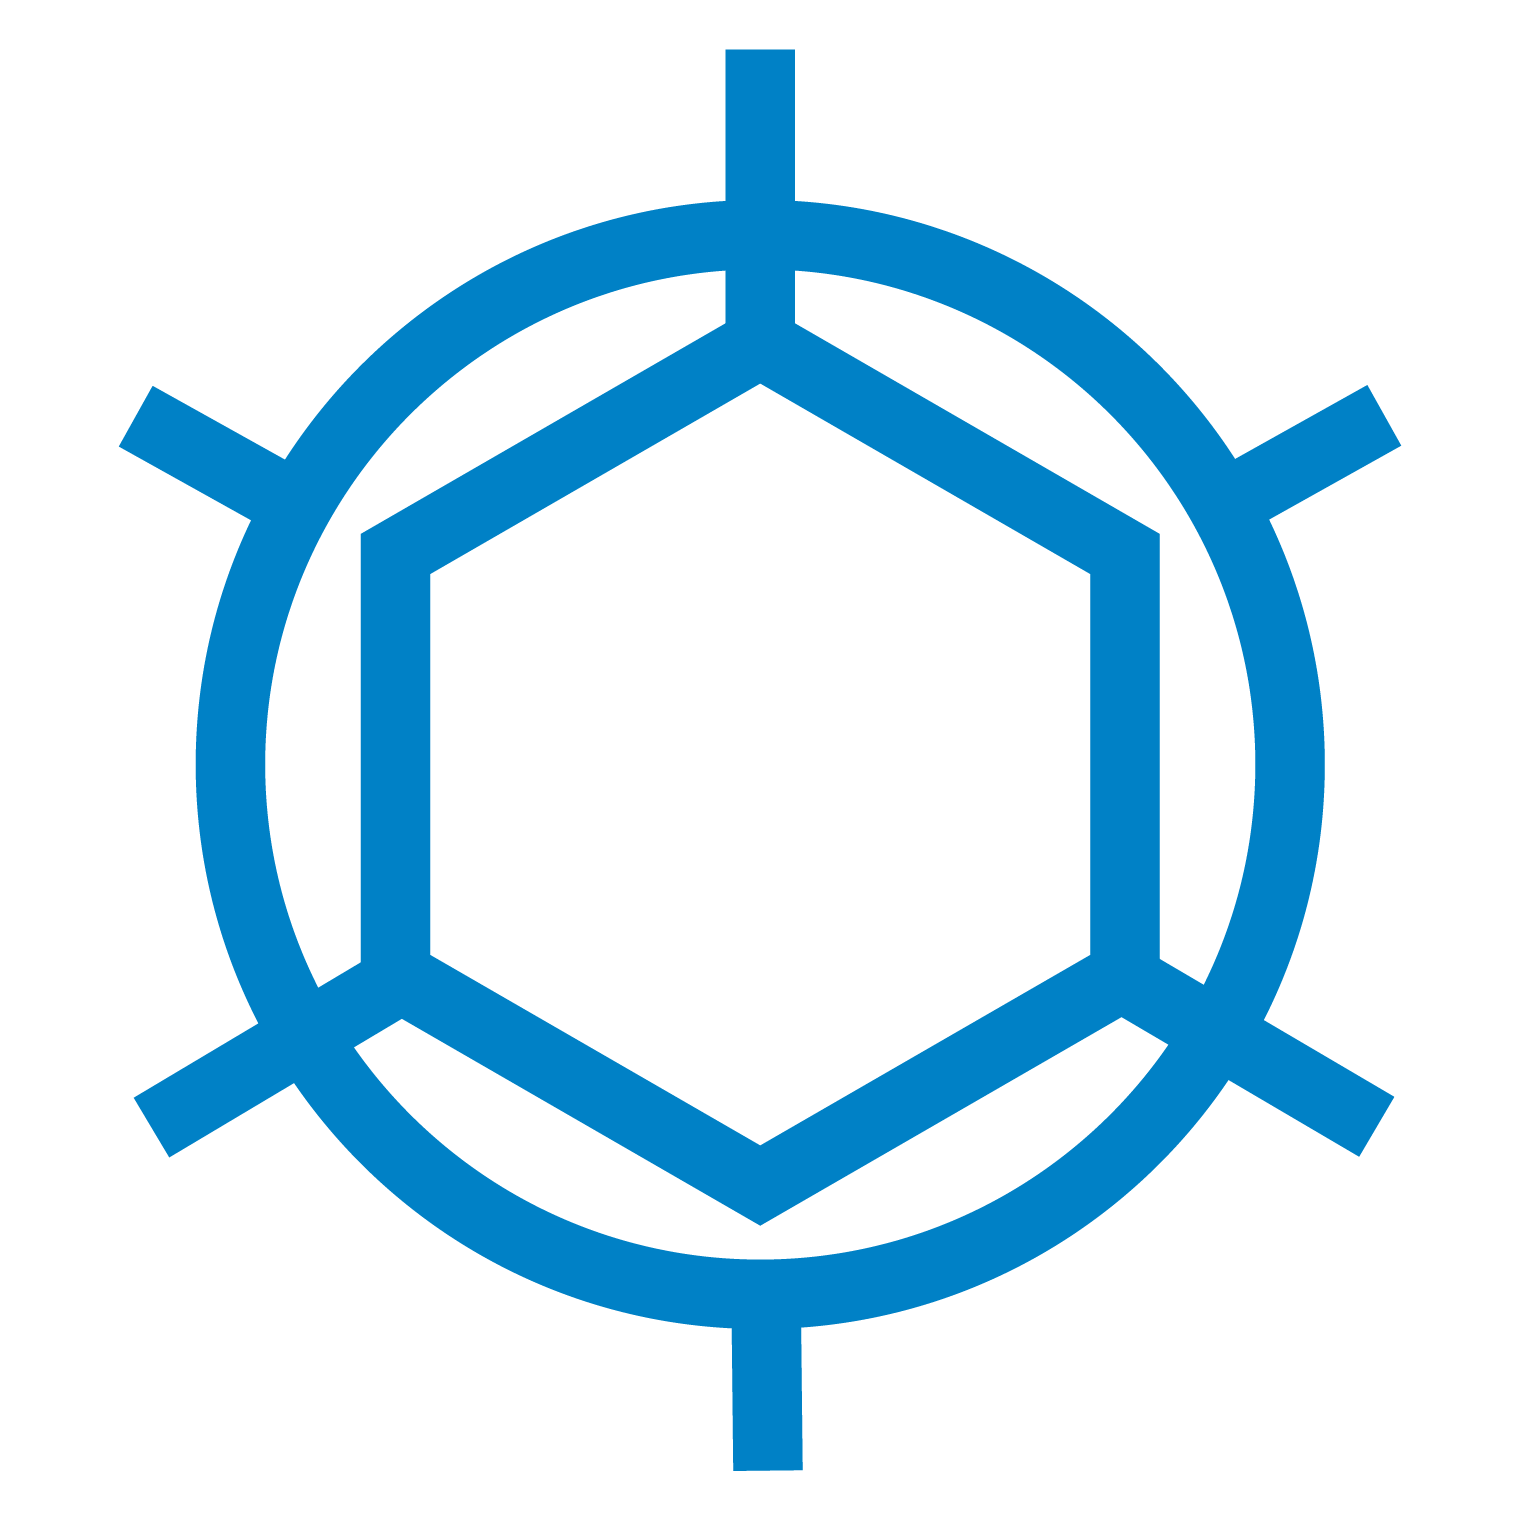 virusIconBlue_Protocols_TJF_2016_6_14-01.png